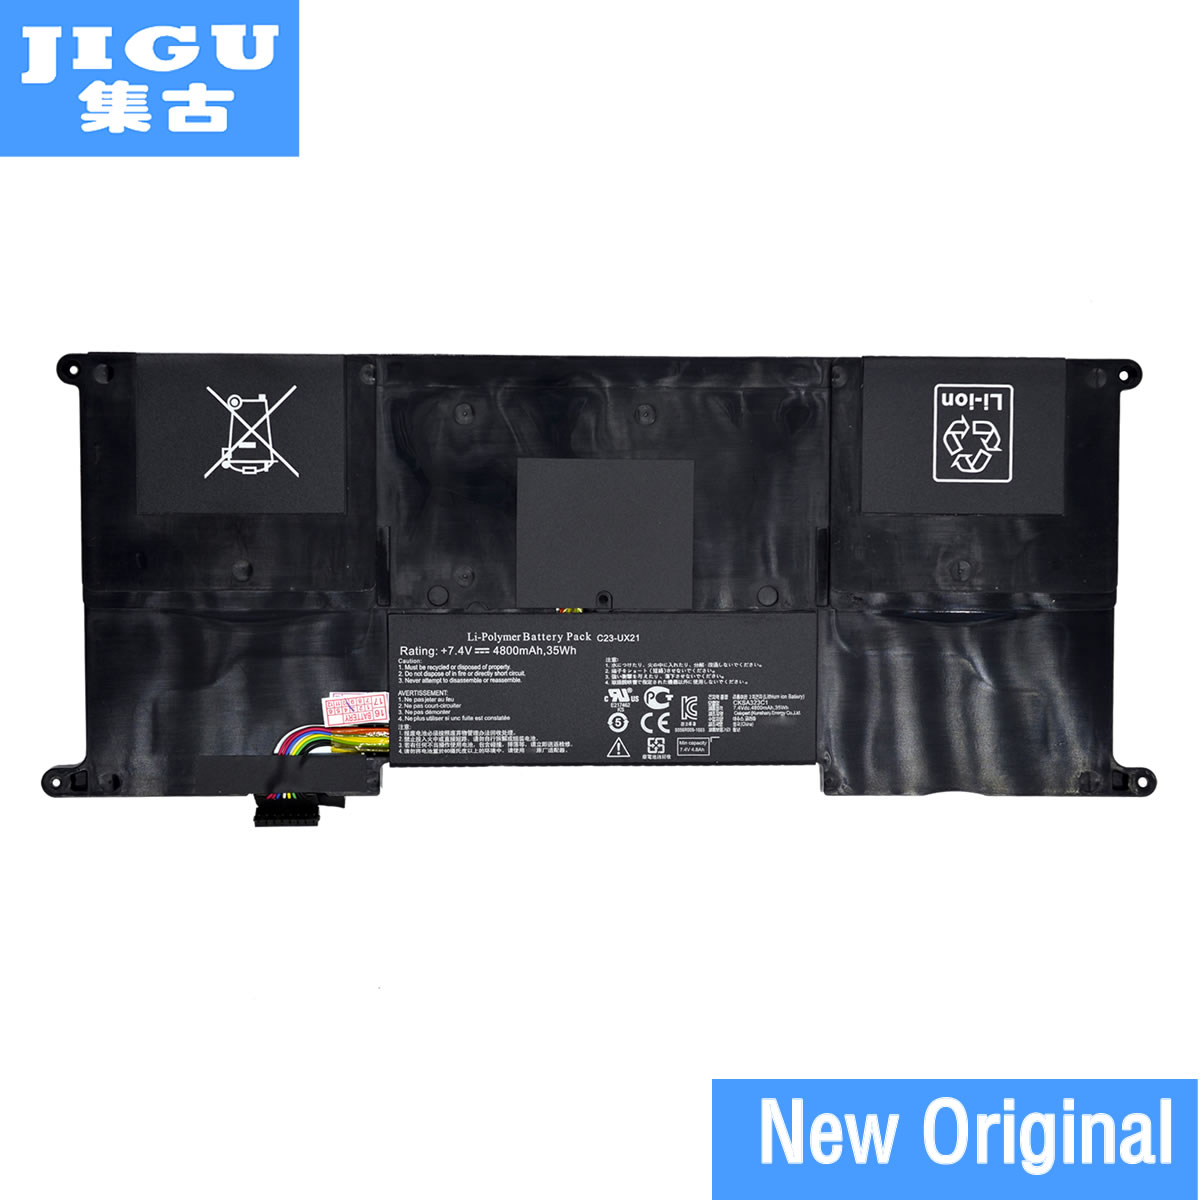 JIGU C23-UX21 C22-UX21 Original laptop Battery For Asus Ultrabook ZENBOOK UX21 UX21A UX21E 7.4V 4800MAH 35WH free shipping new 50wh genuine c32n1305 battery for asus zenbook infinity ux301la ultrabook laptop